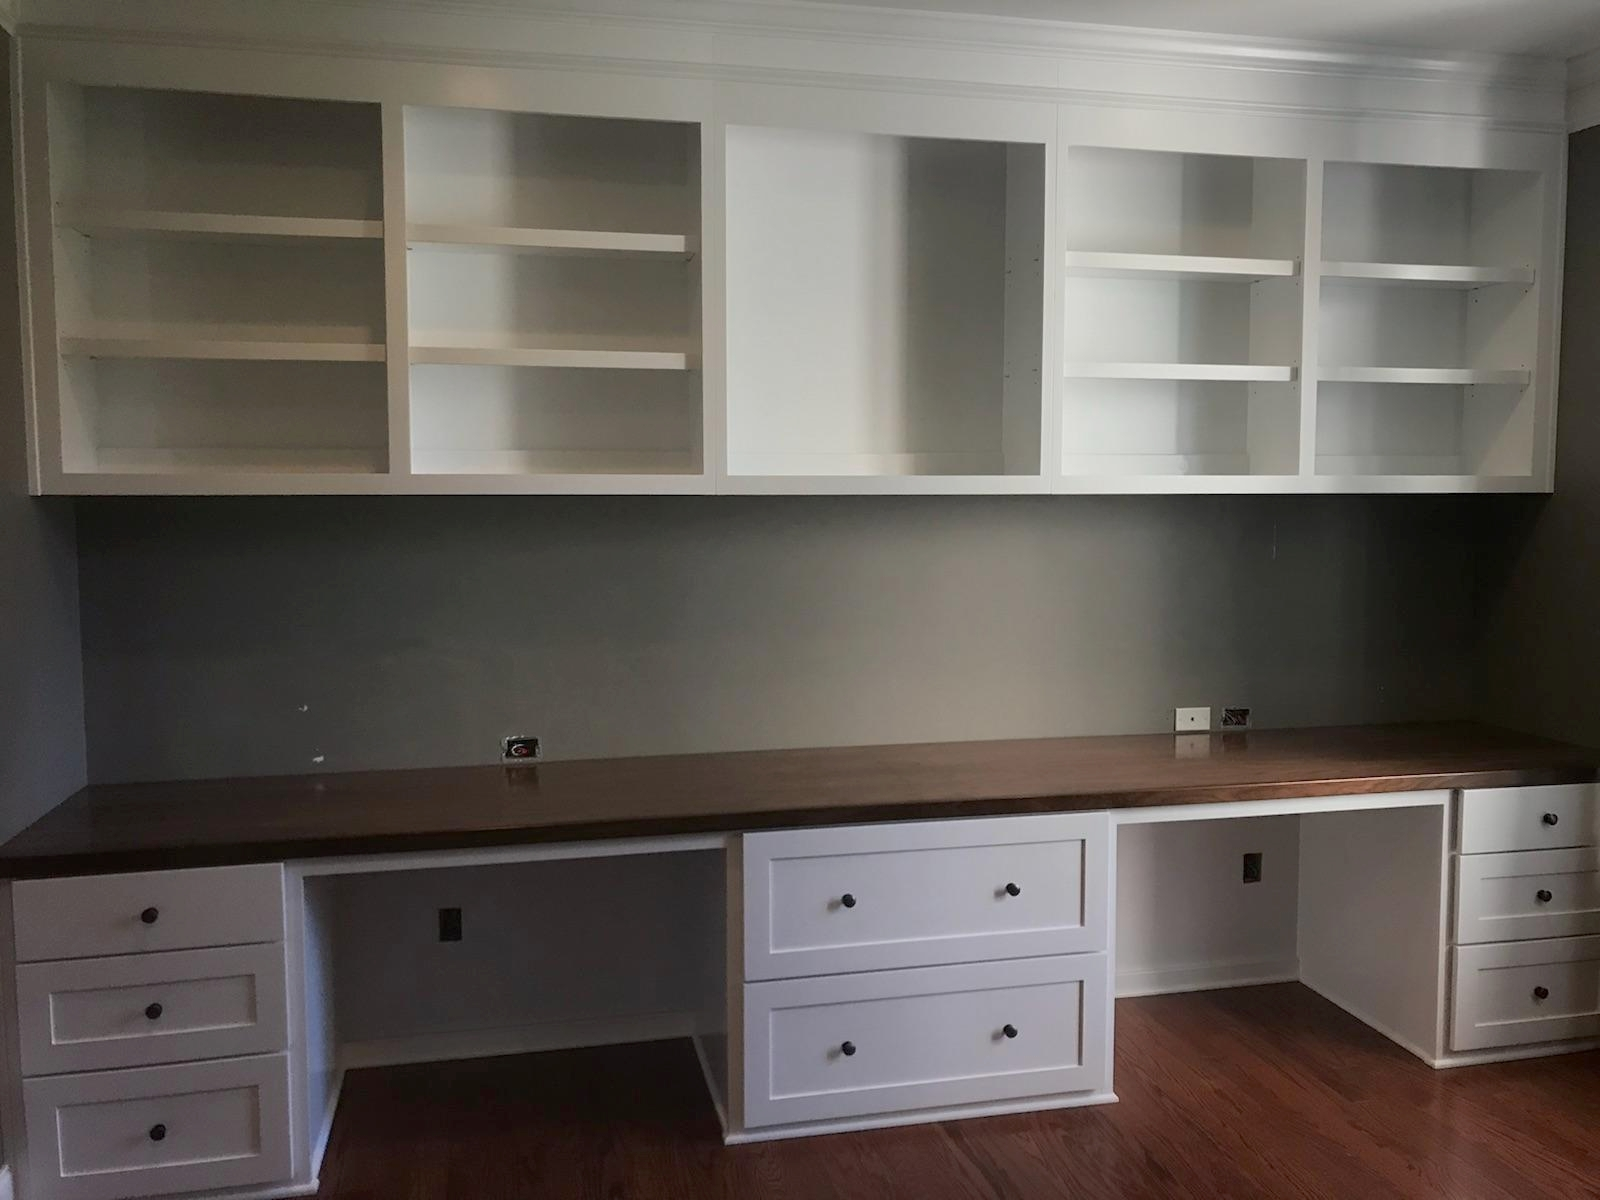 Custom Desk with Shaker Filing Drawers, Slab Drawers, Adjustable Shelves, Header Detail, And Clear Coat Walnut Countertop